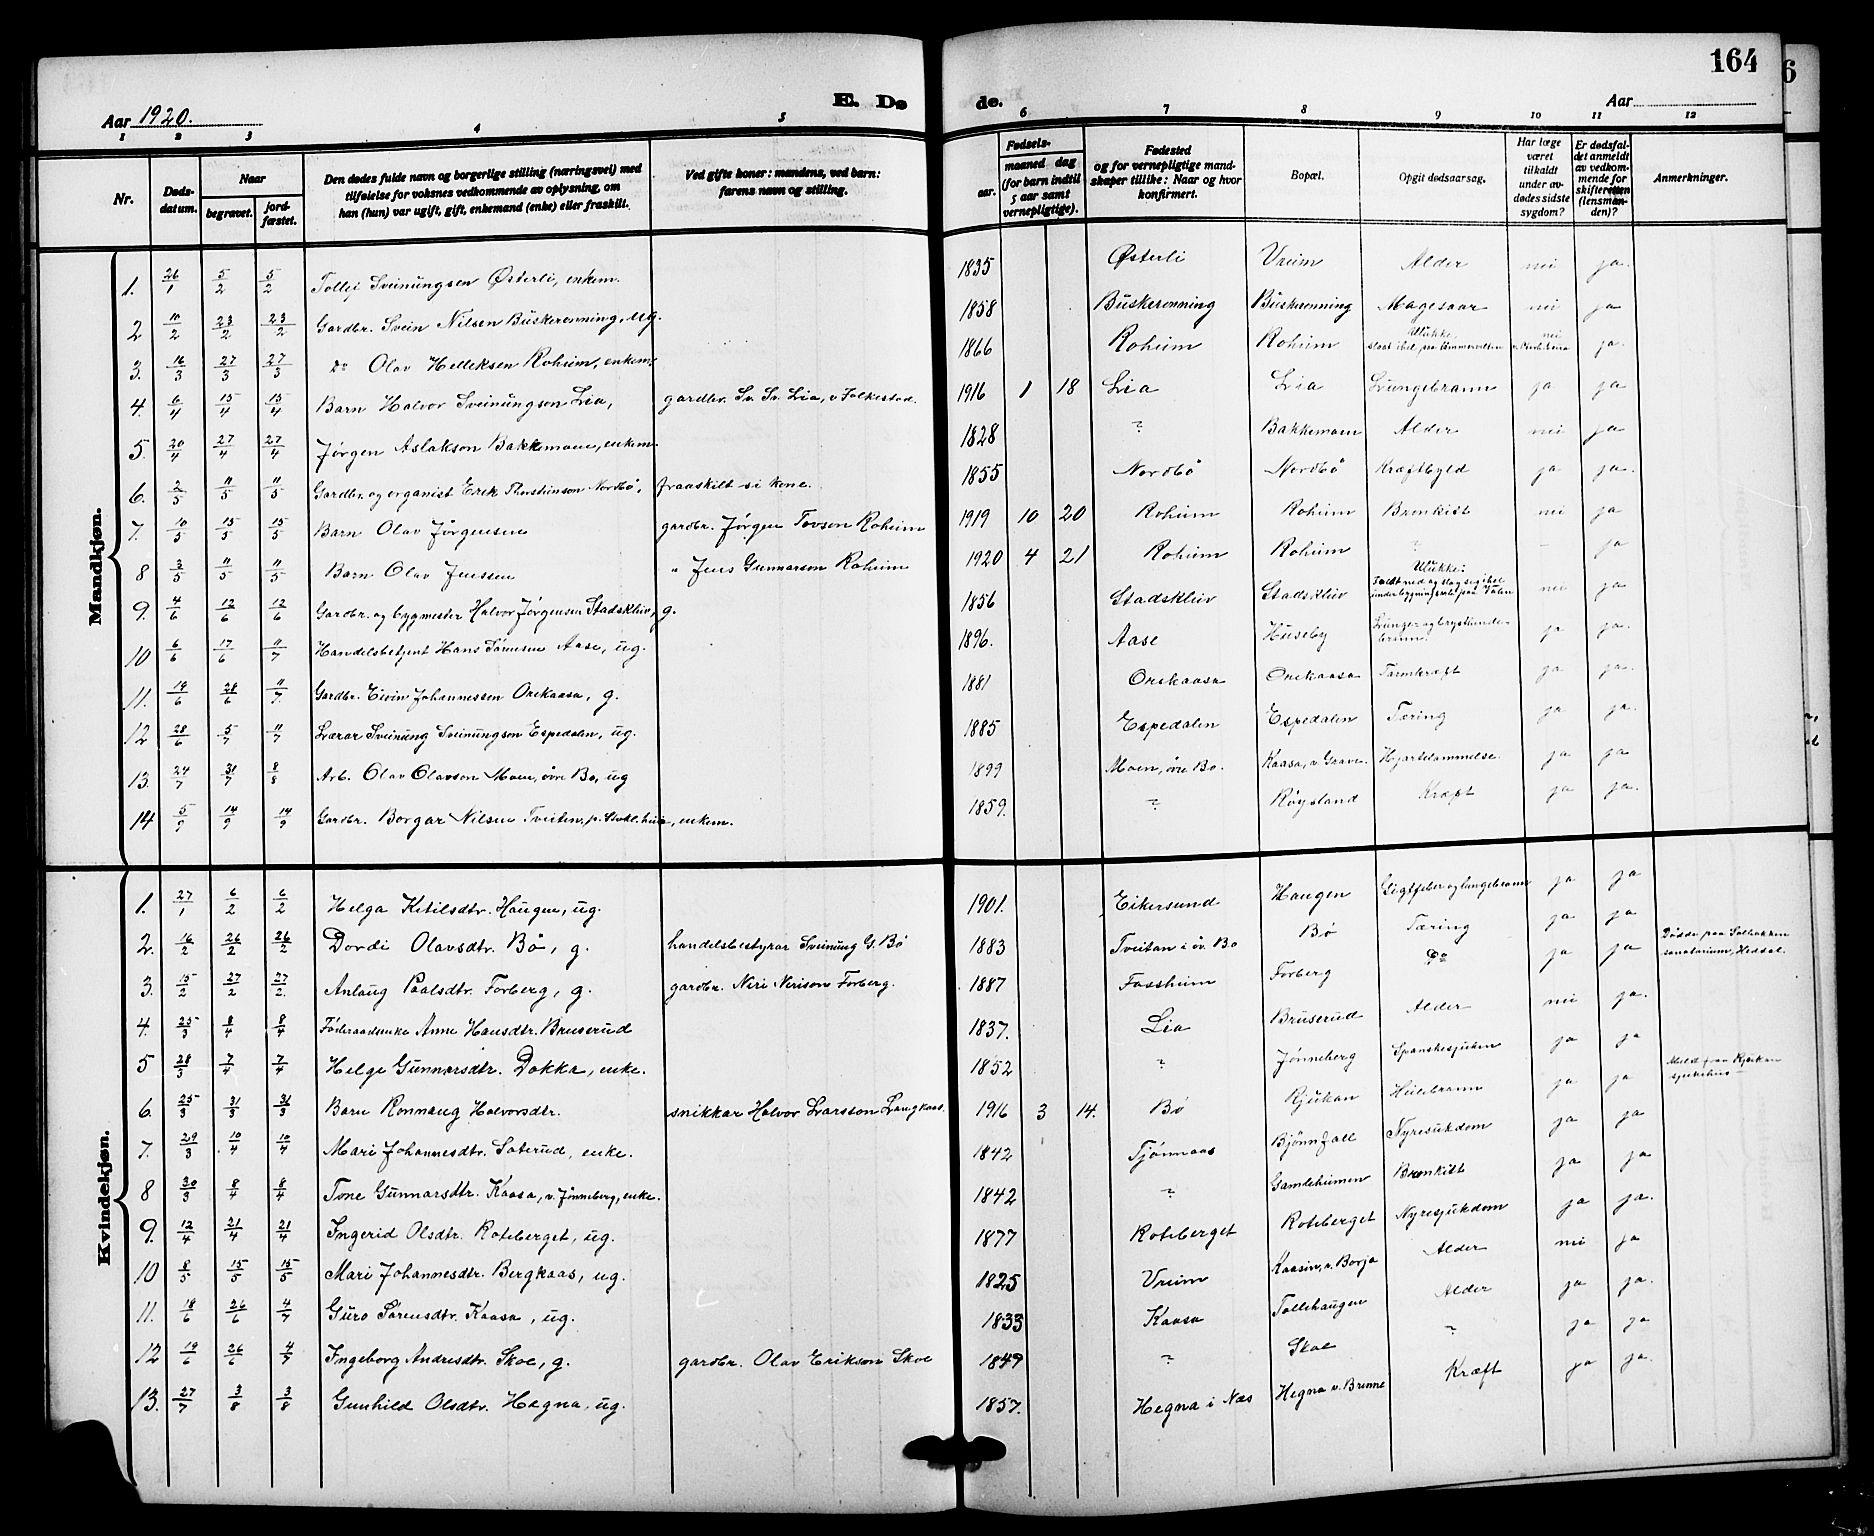 SAKO, Bø kirkebøker, G/Ga/L0007: Klokkerbok nr. 7, 1909-1924, s. 164